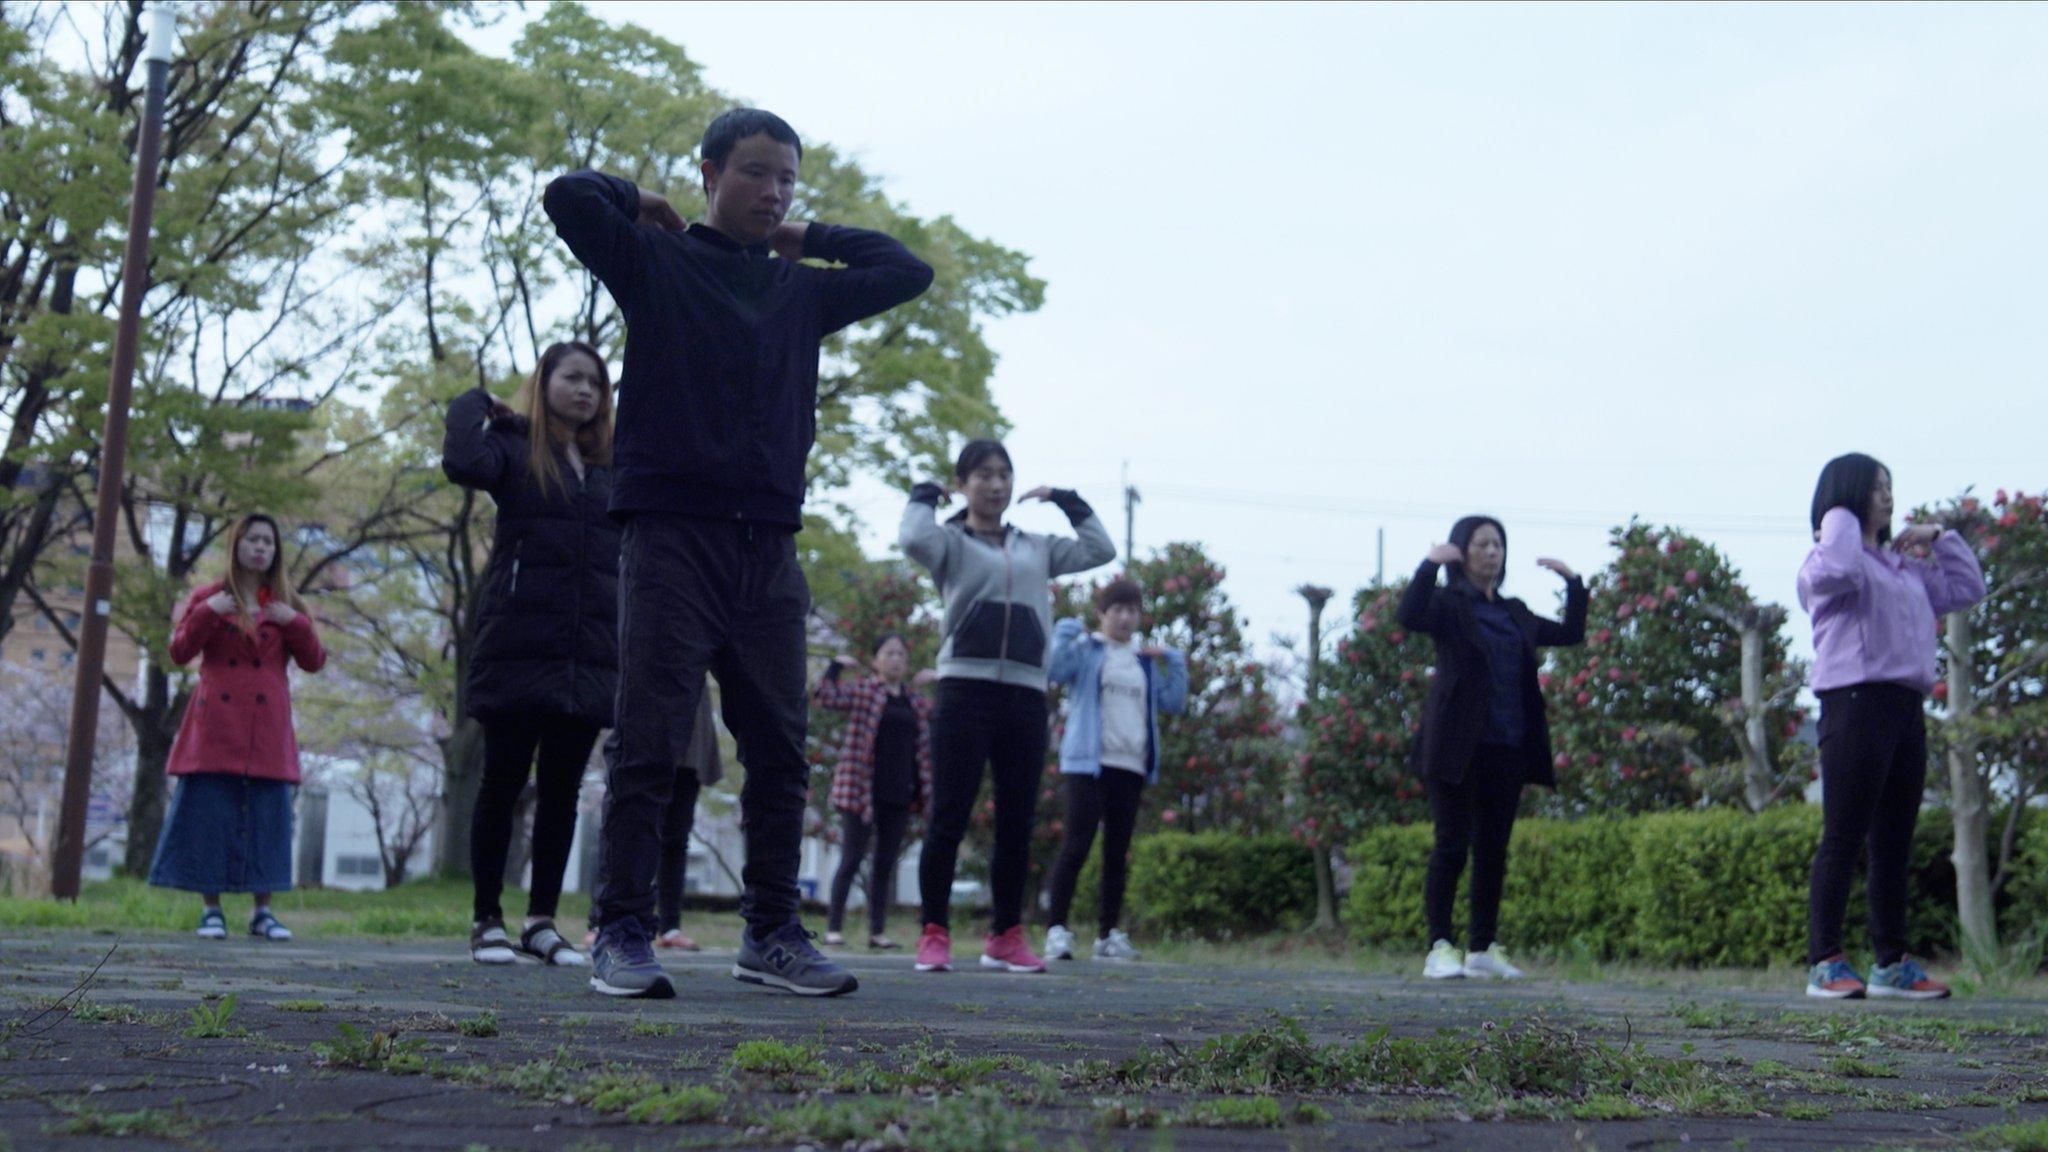 Pekerja migran di Jepang melakukan senam pagi di taman dekat penampungan tempat mereka tinggal.